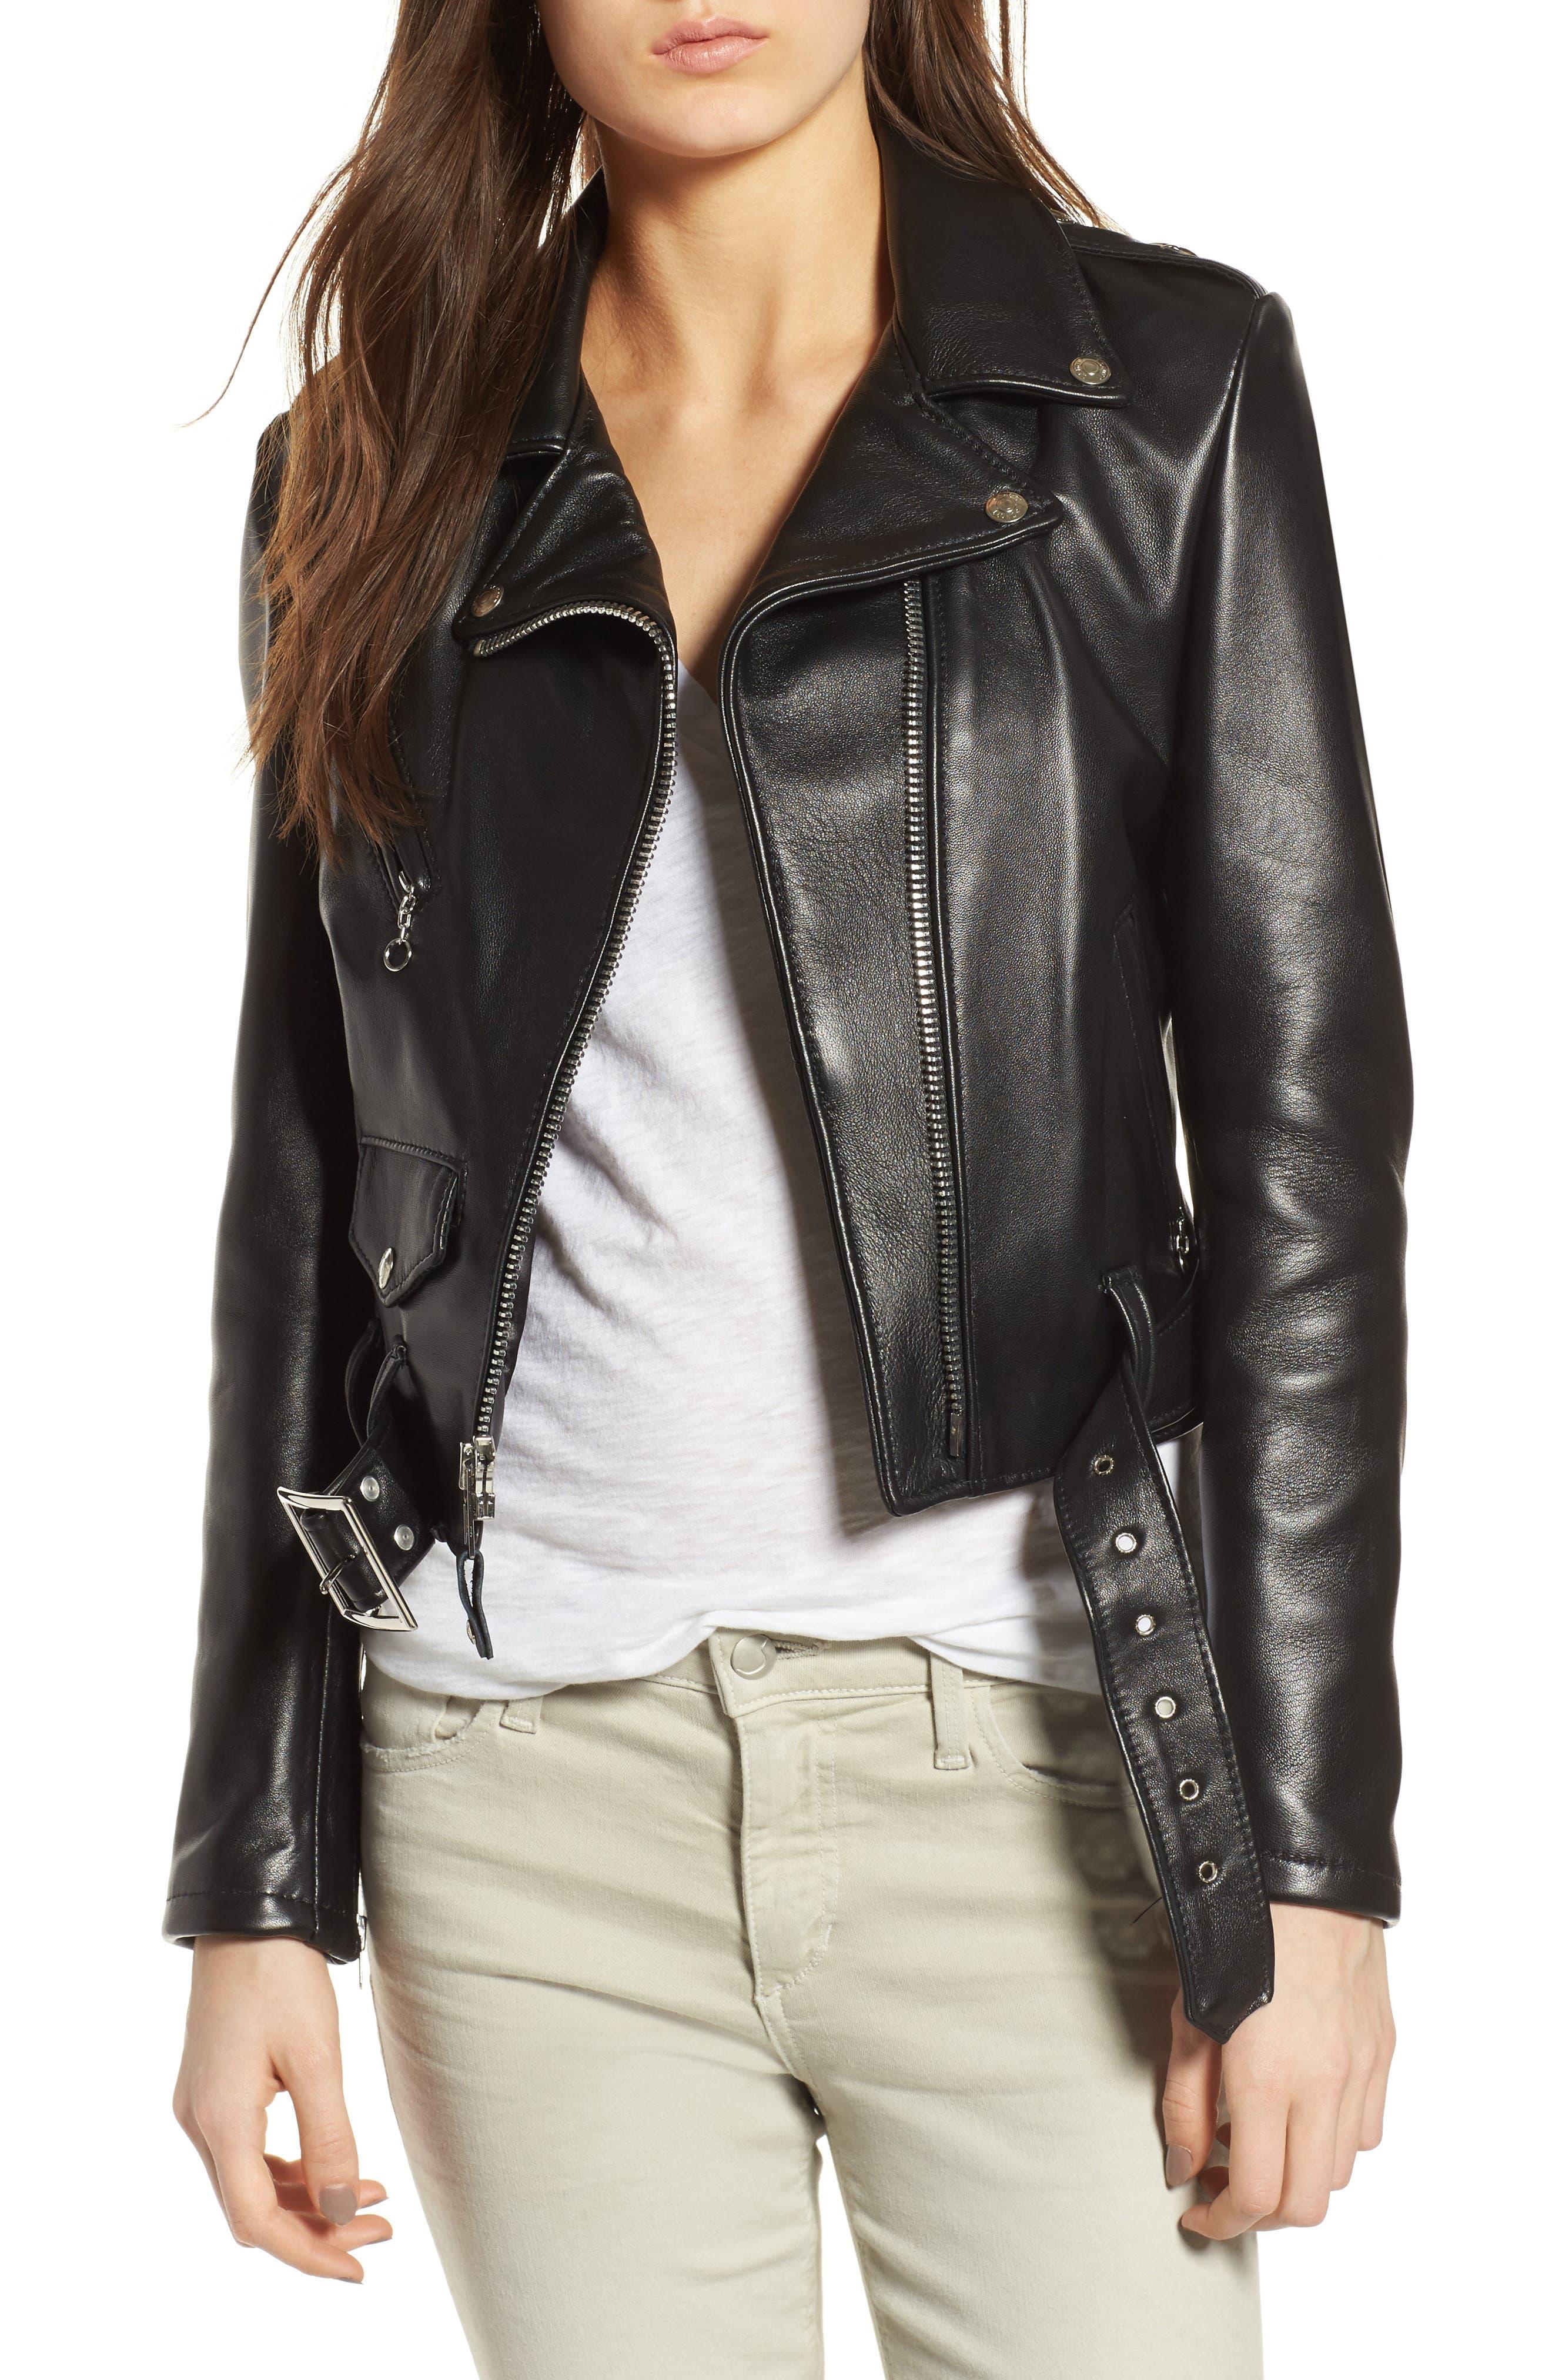 Crop Leather Jacket in Black